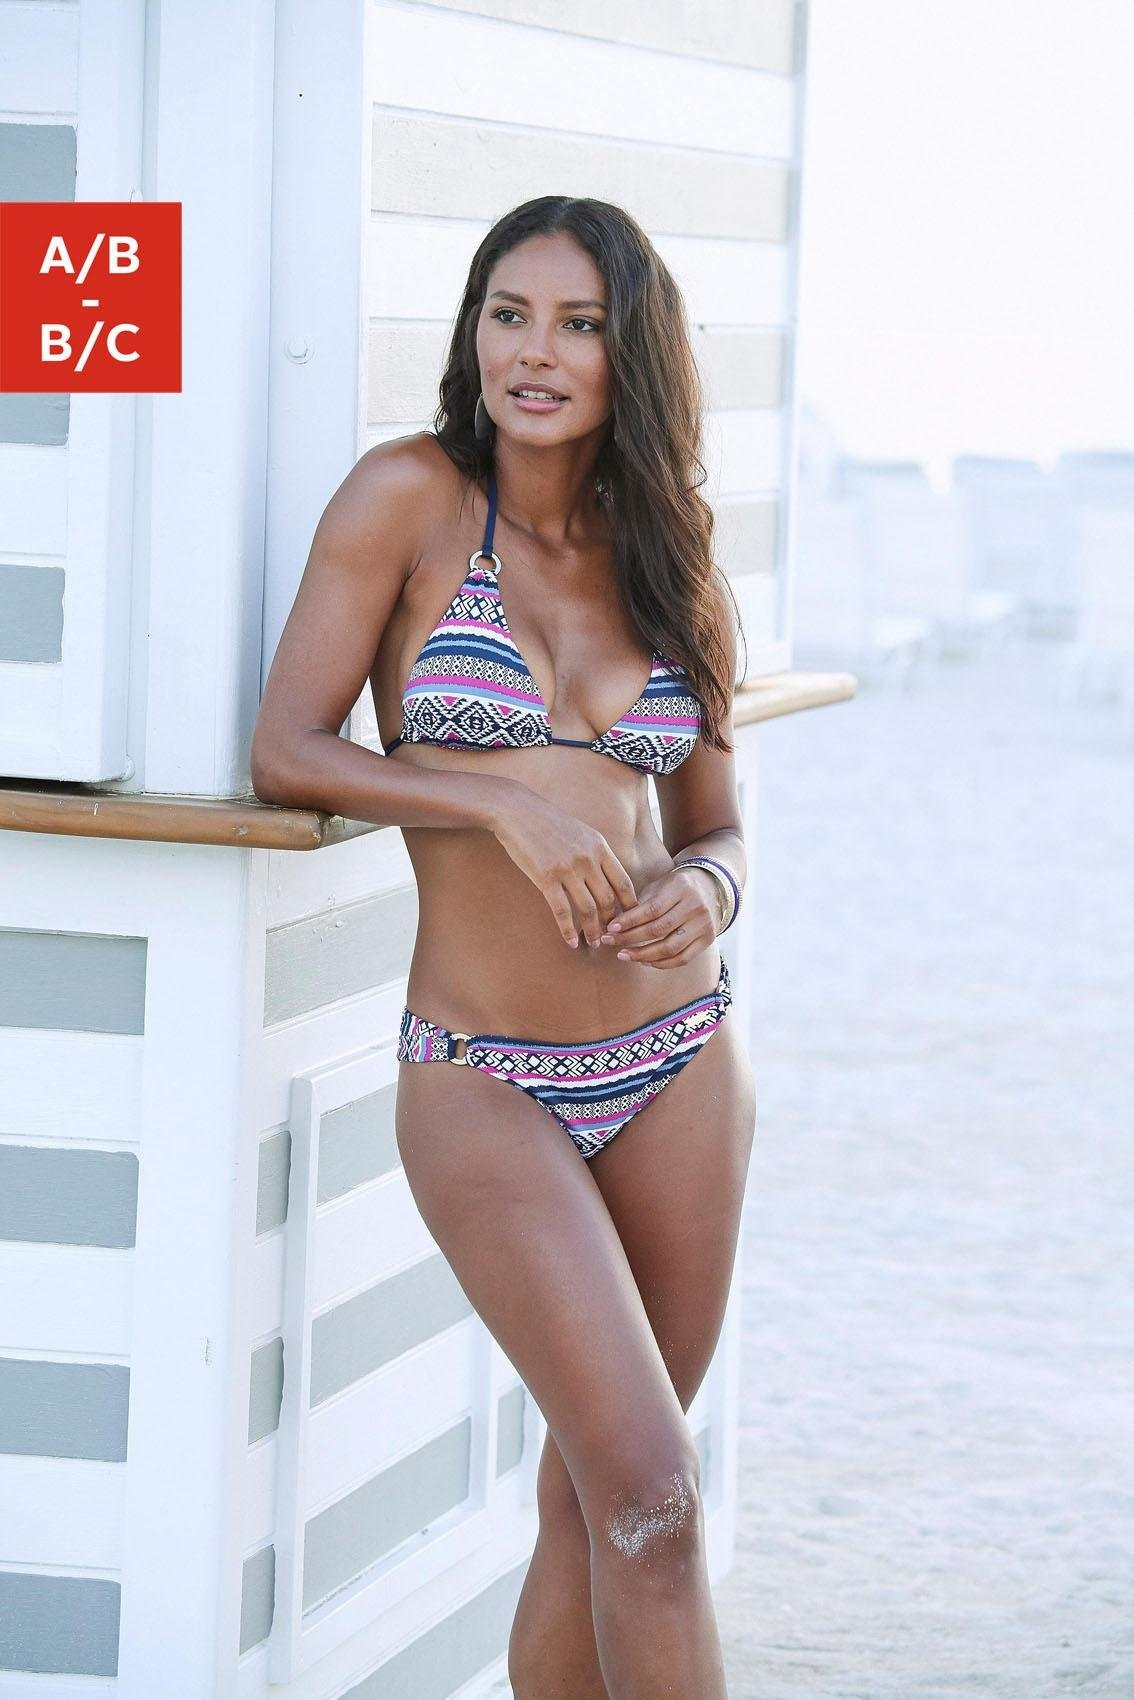 Lascana triangel-bikinitop Wintu met goudkleurige sierringen goedkoop op lascana.nl kopen